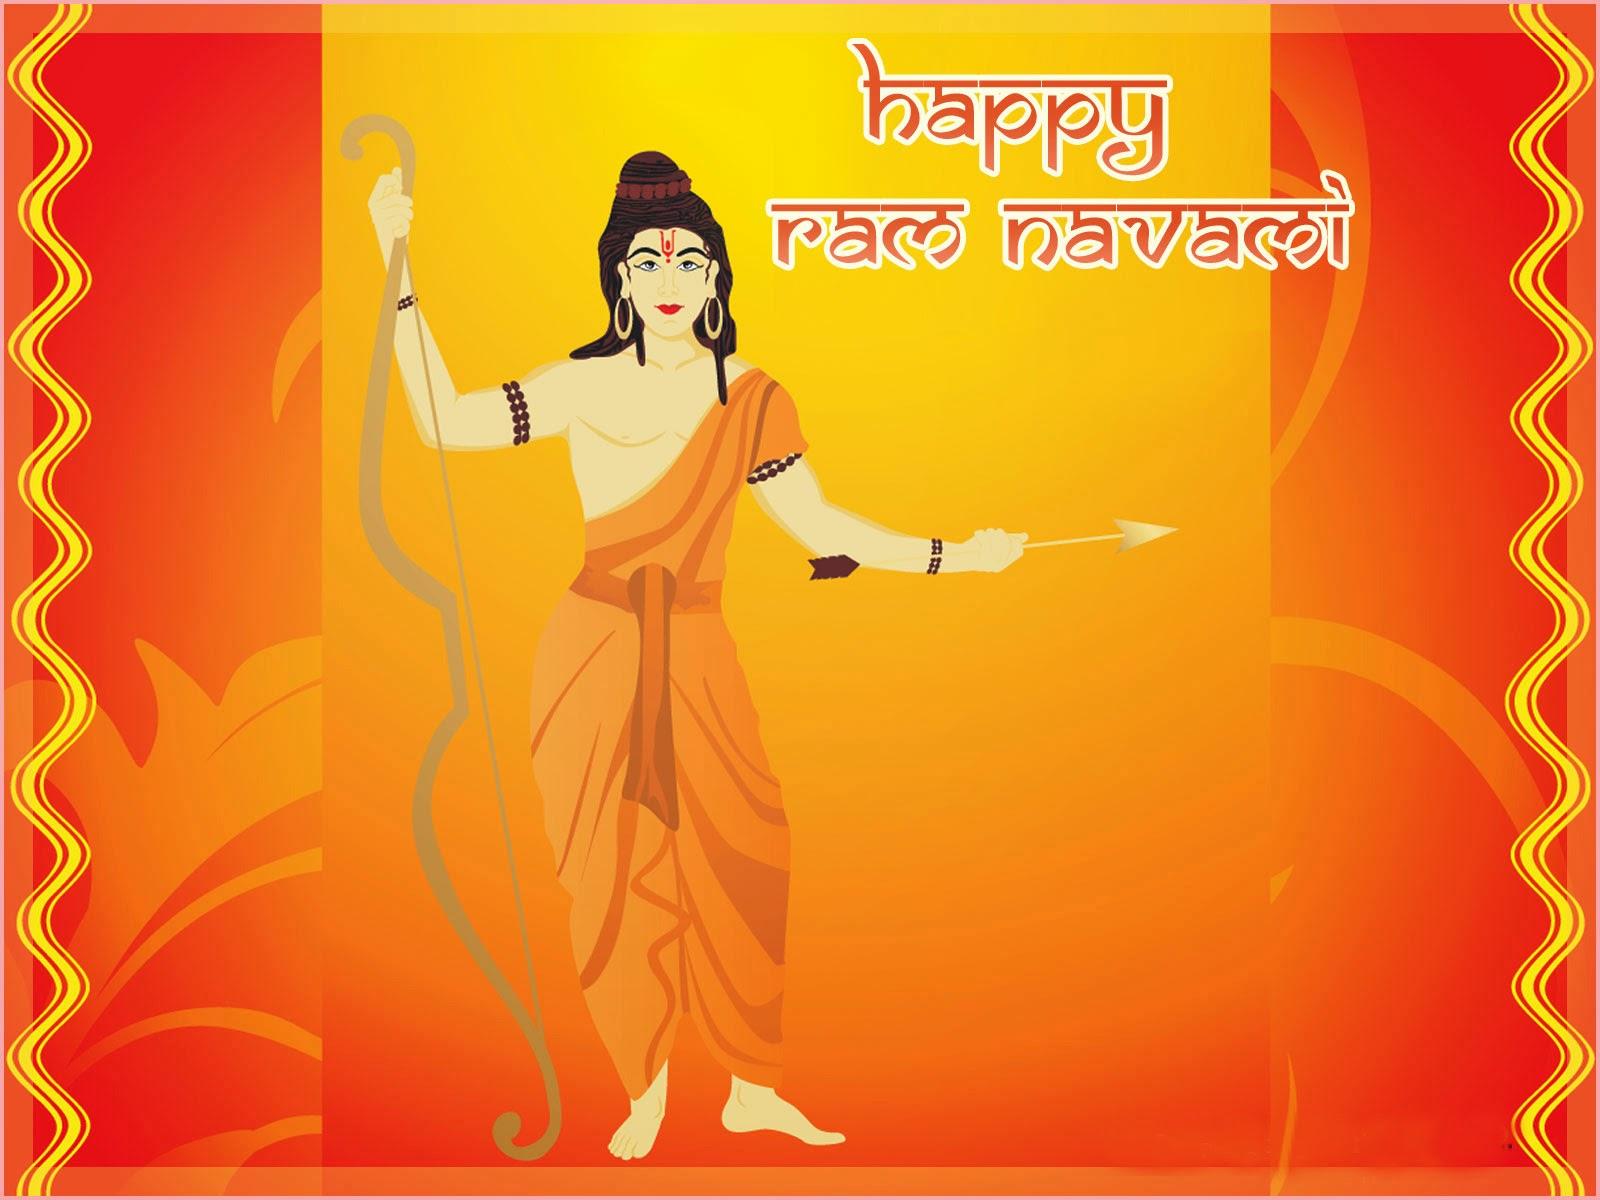 Happy Sri Rama Navami Hd Wallpapers Fb Covers Images Photo Greetings